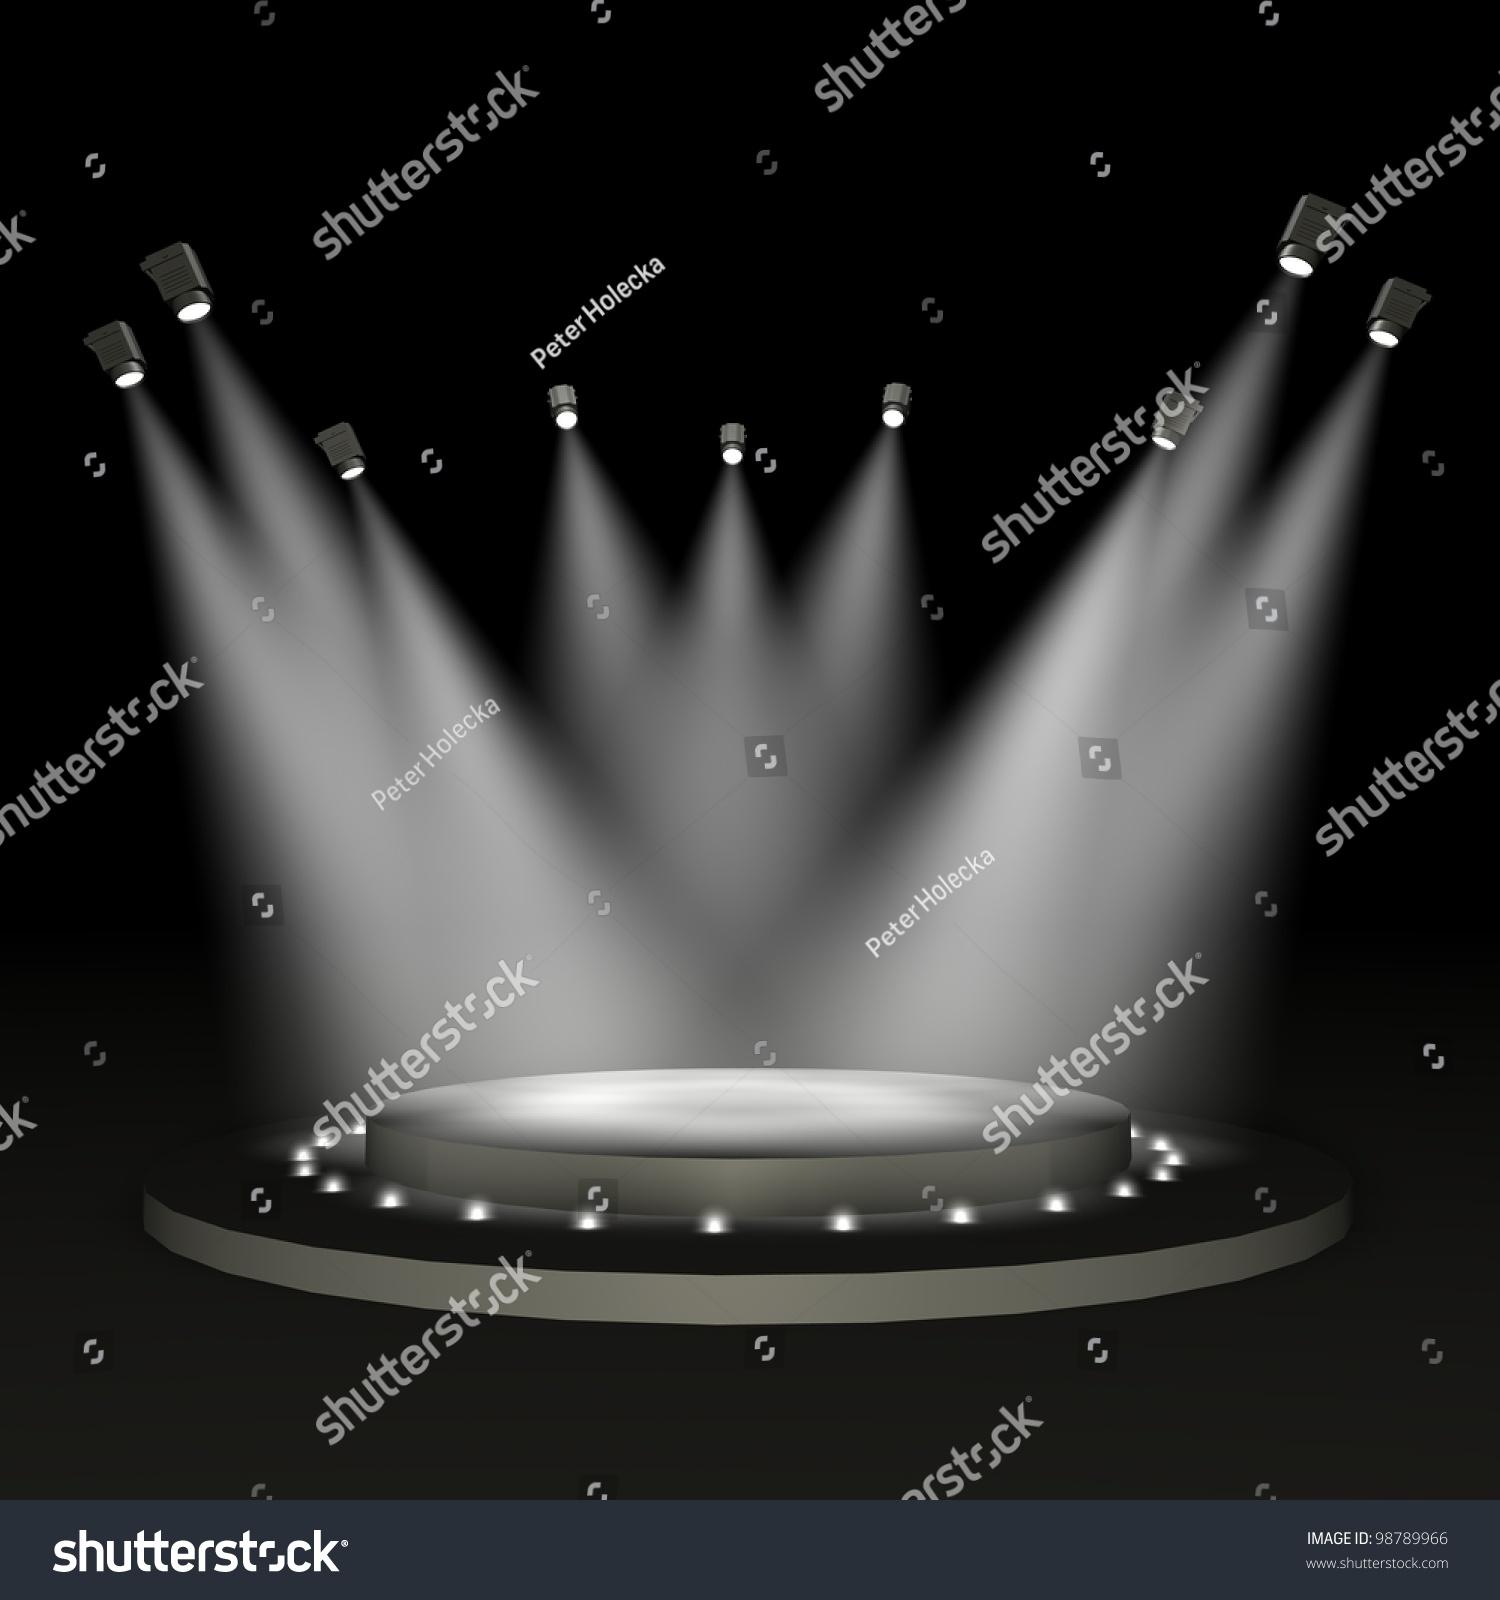 Stadium Of Lights: Stadium Lights Stock Photo 98789966 : Shutterstock